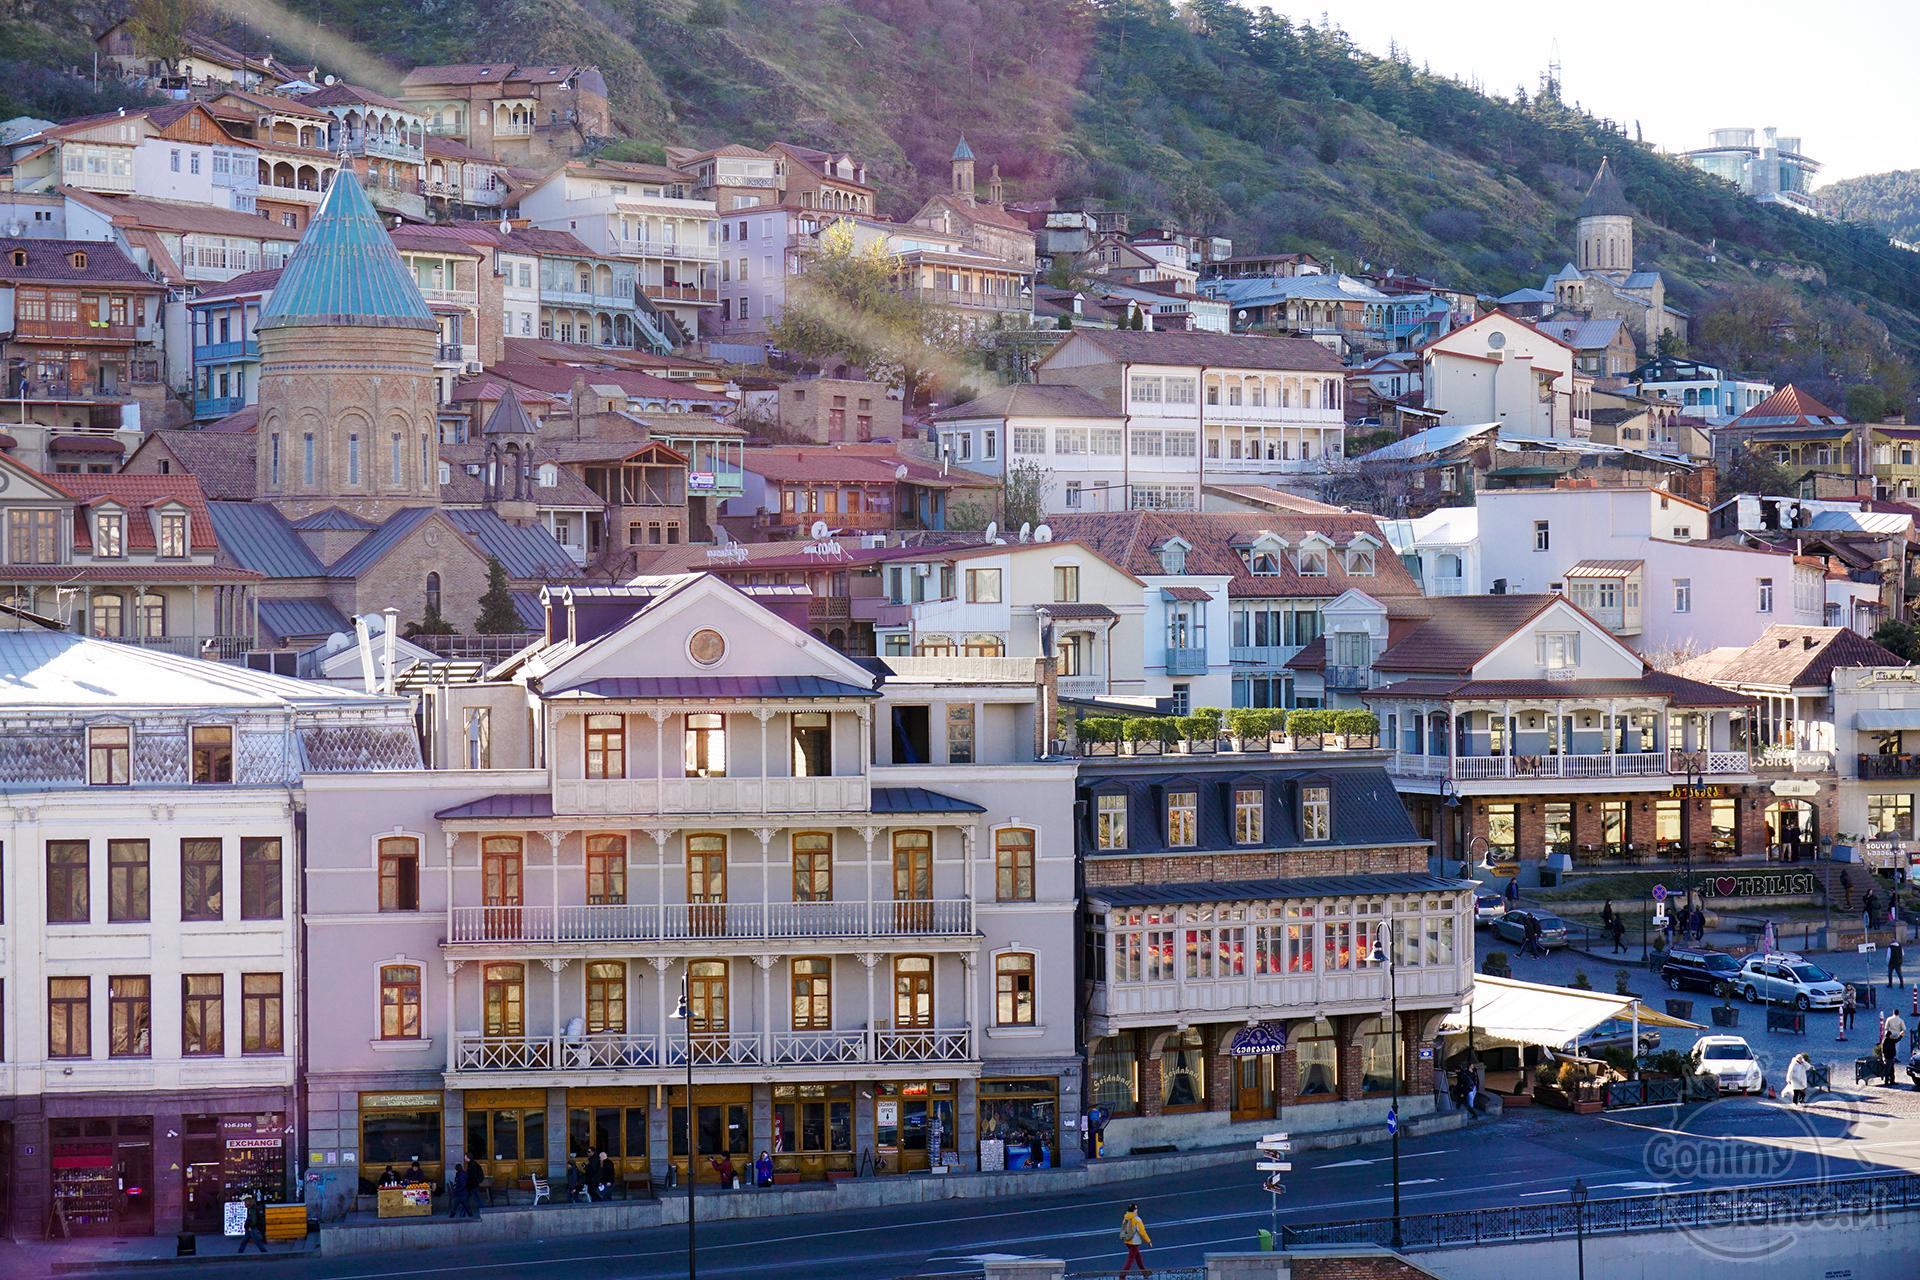 Tbilisi TOP 10 miejsc które warto zobaczyć | Stare Miasto  - Old Tbilisi